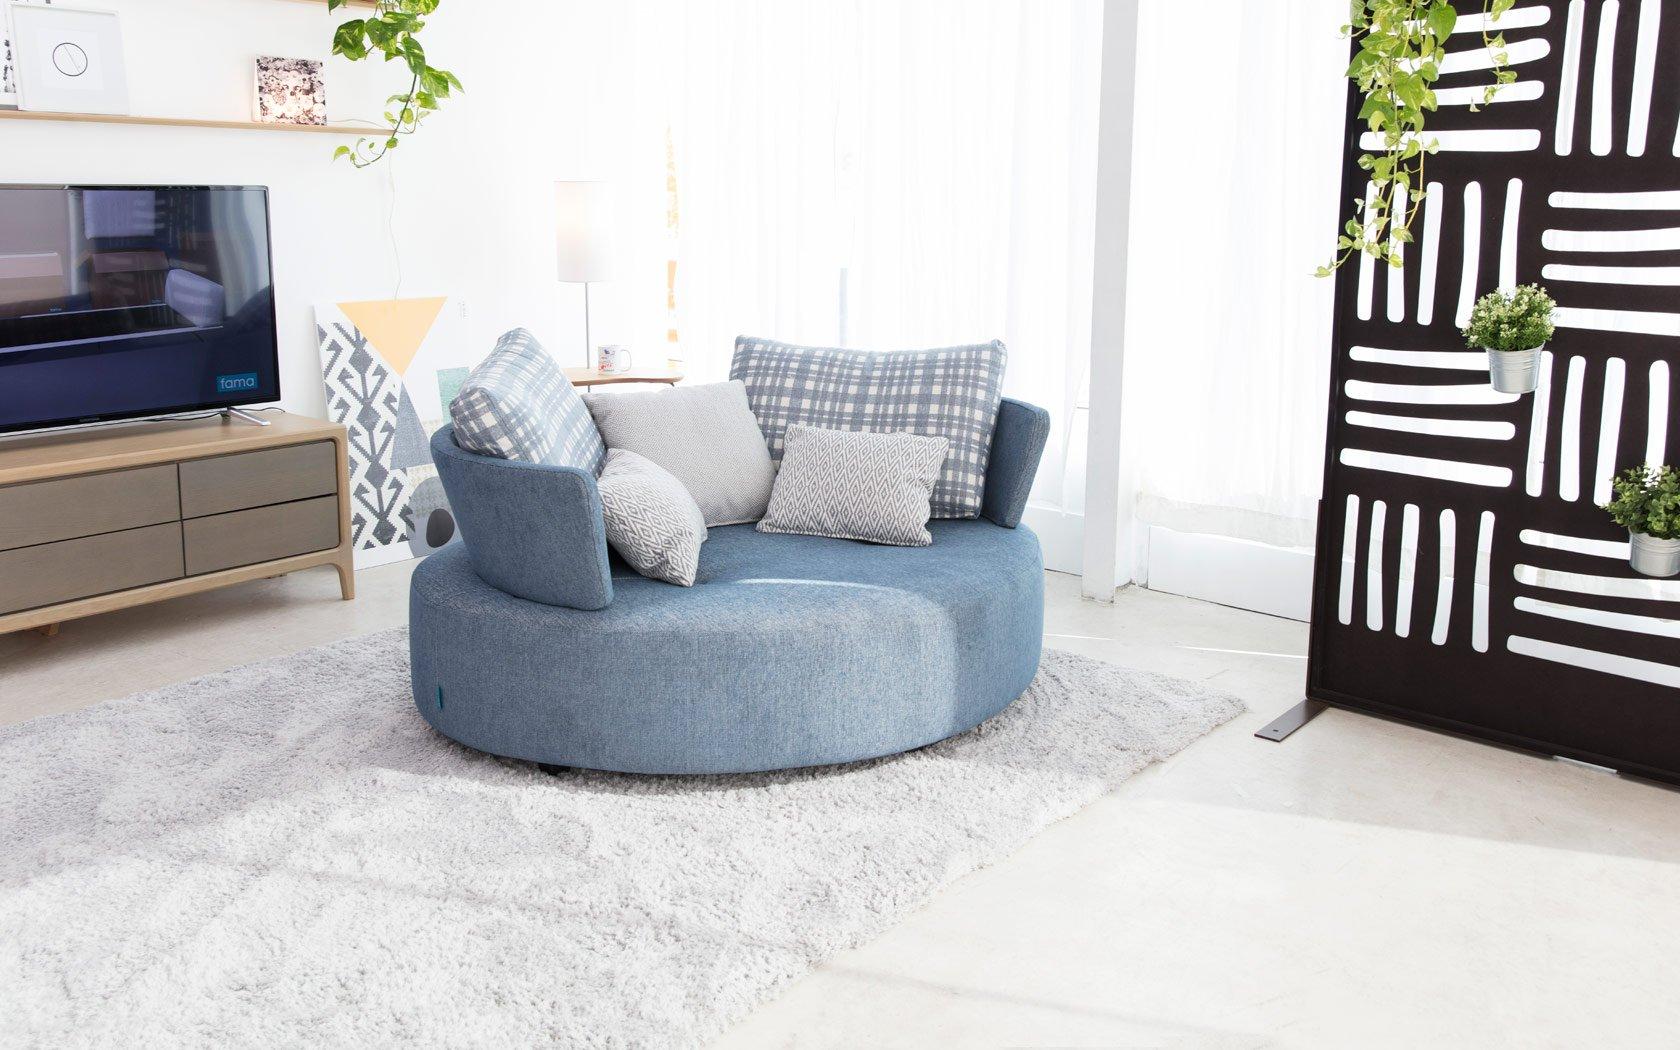 Mycuore sofa Fama 2020 01